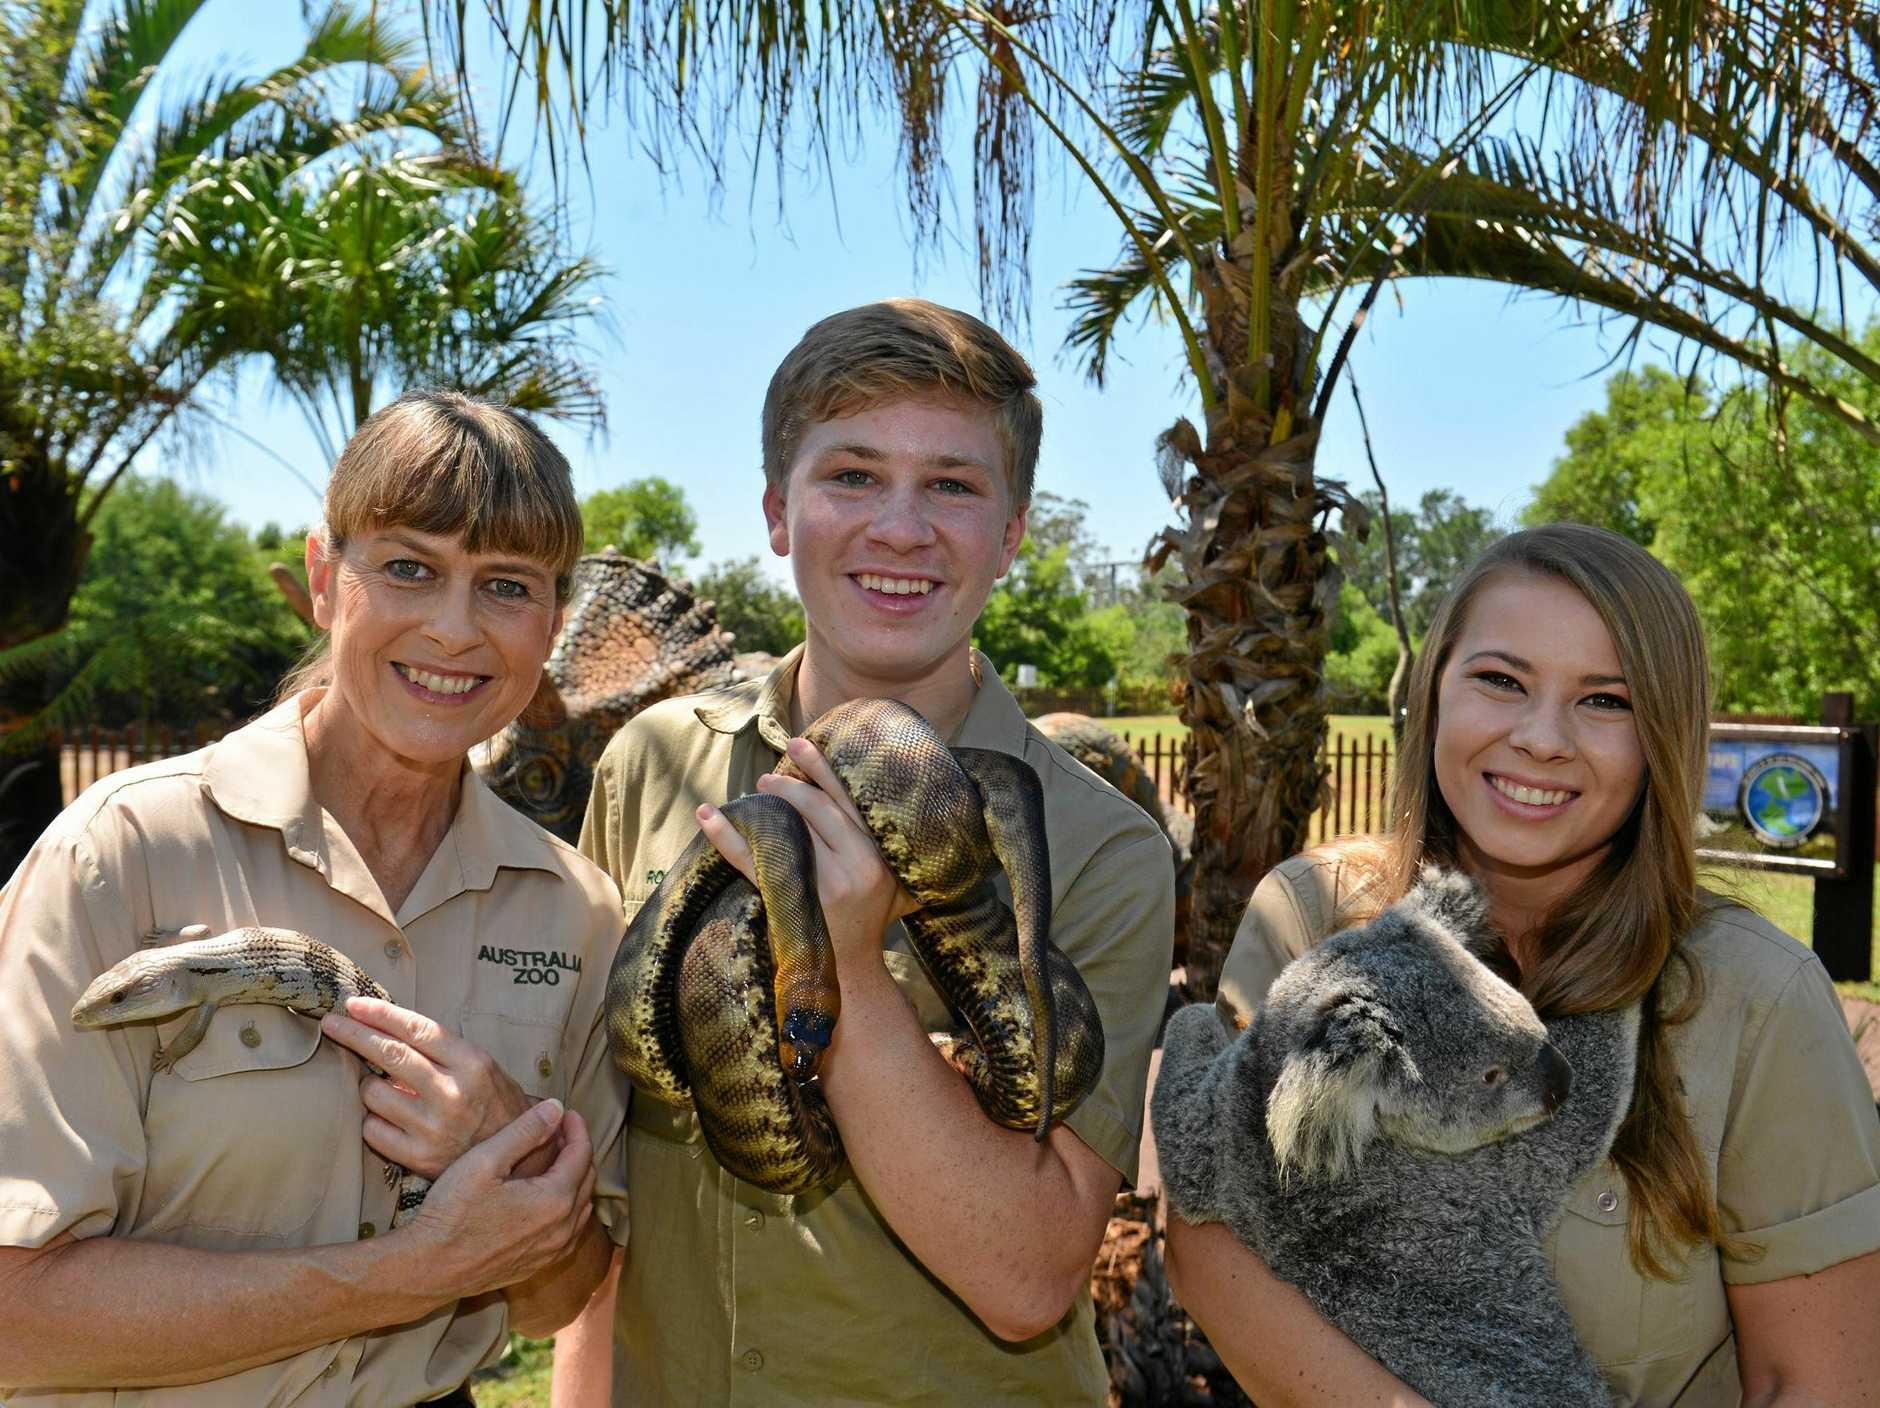 Terri, Robert and Bindi Irwin have been honoured with the Australian Tourism Legend Award.